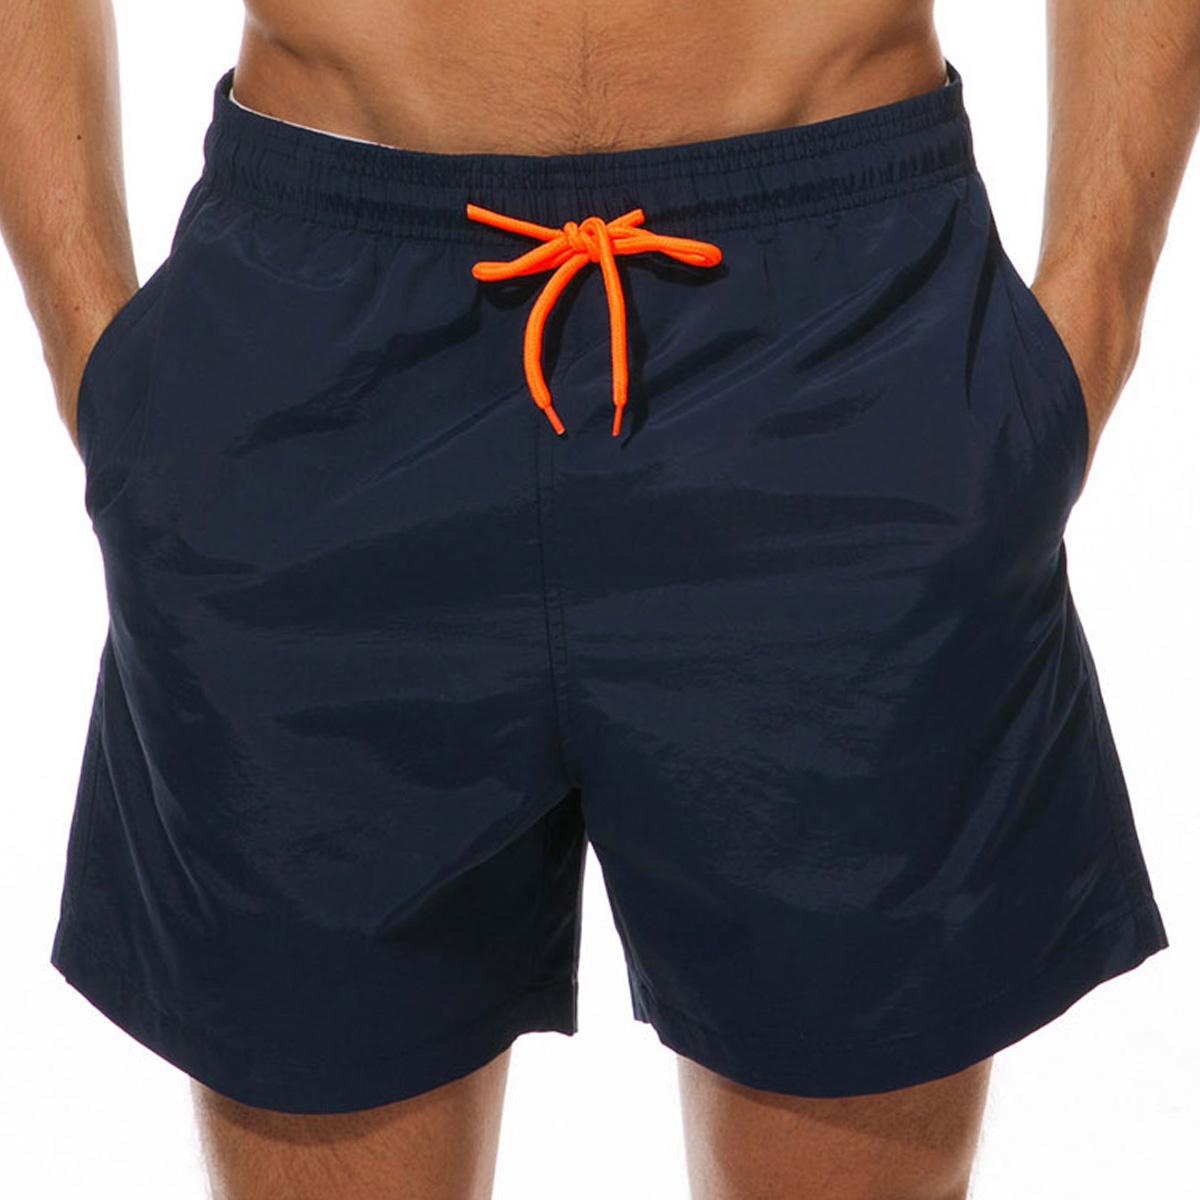 Mesh Liner Quick Dry Drawstring Waist Bermuda Men's Swim Trunks